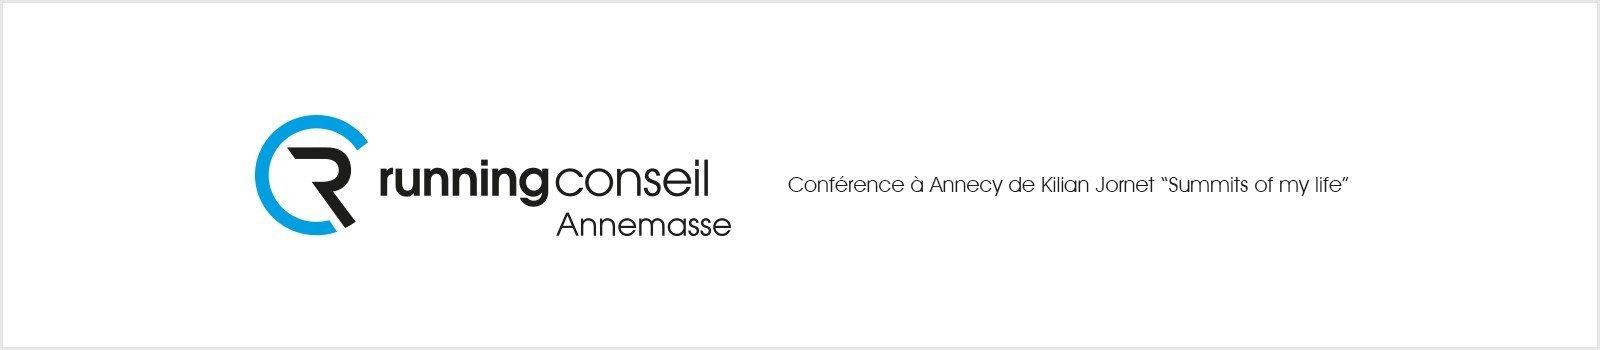 "Conférence à Annecy de Kilian Jornet ""Summits of my life"""